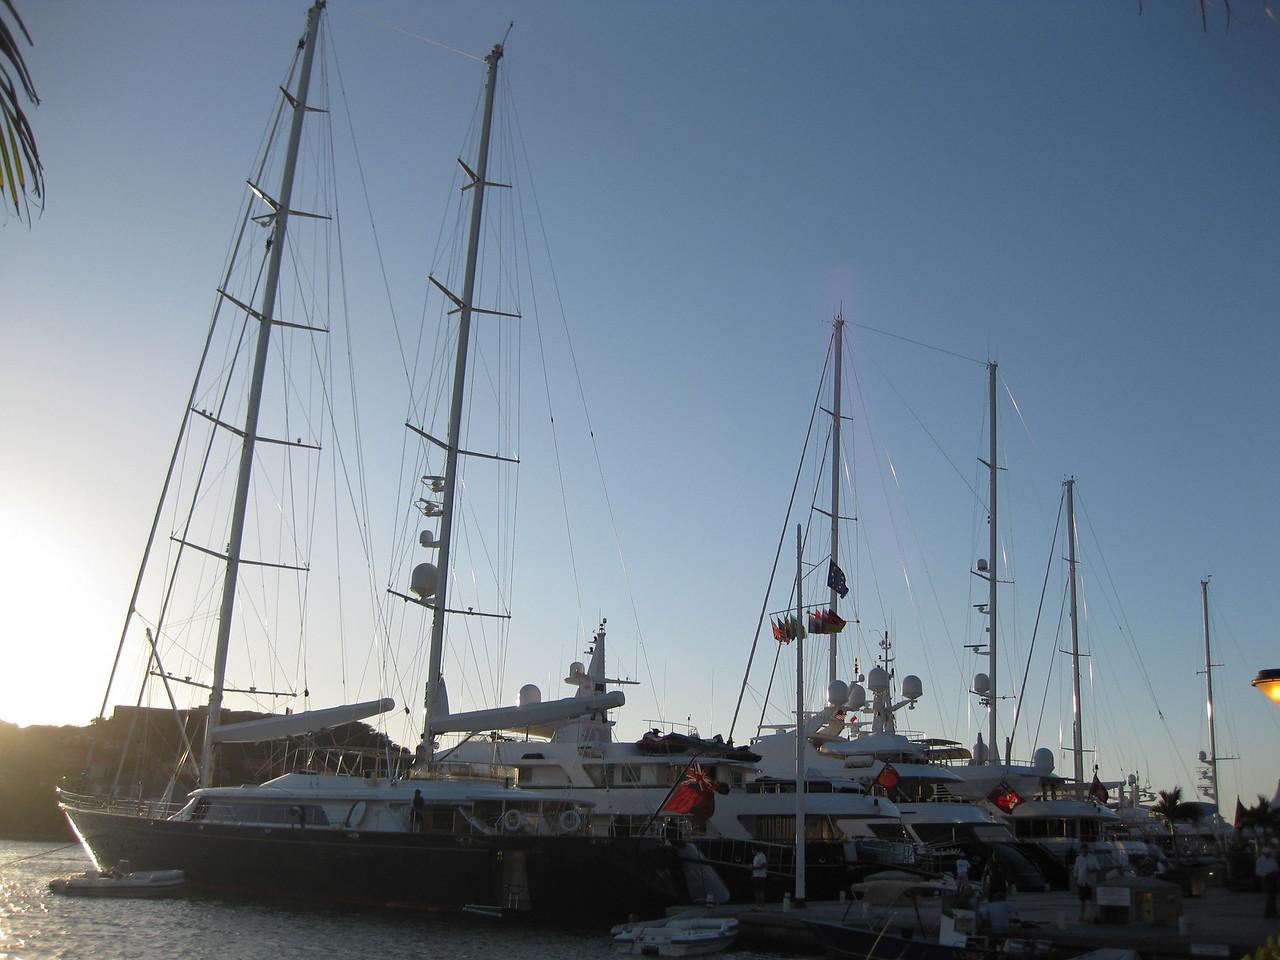 Saint Barth - Yachts